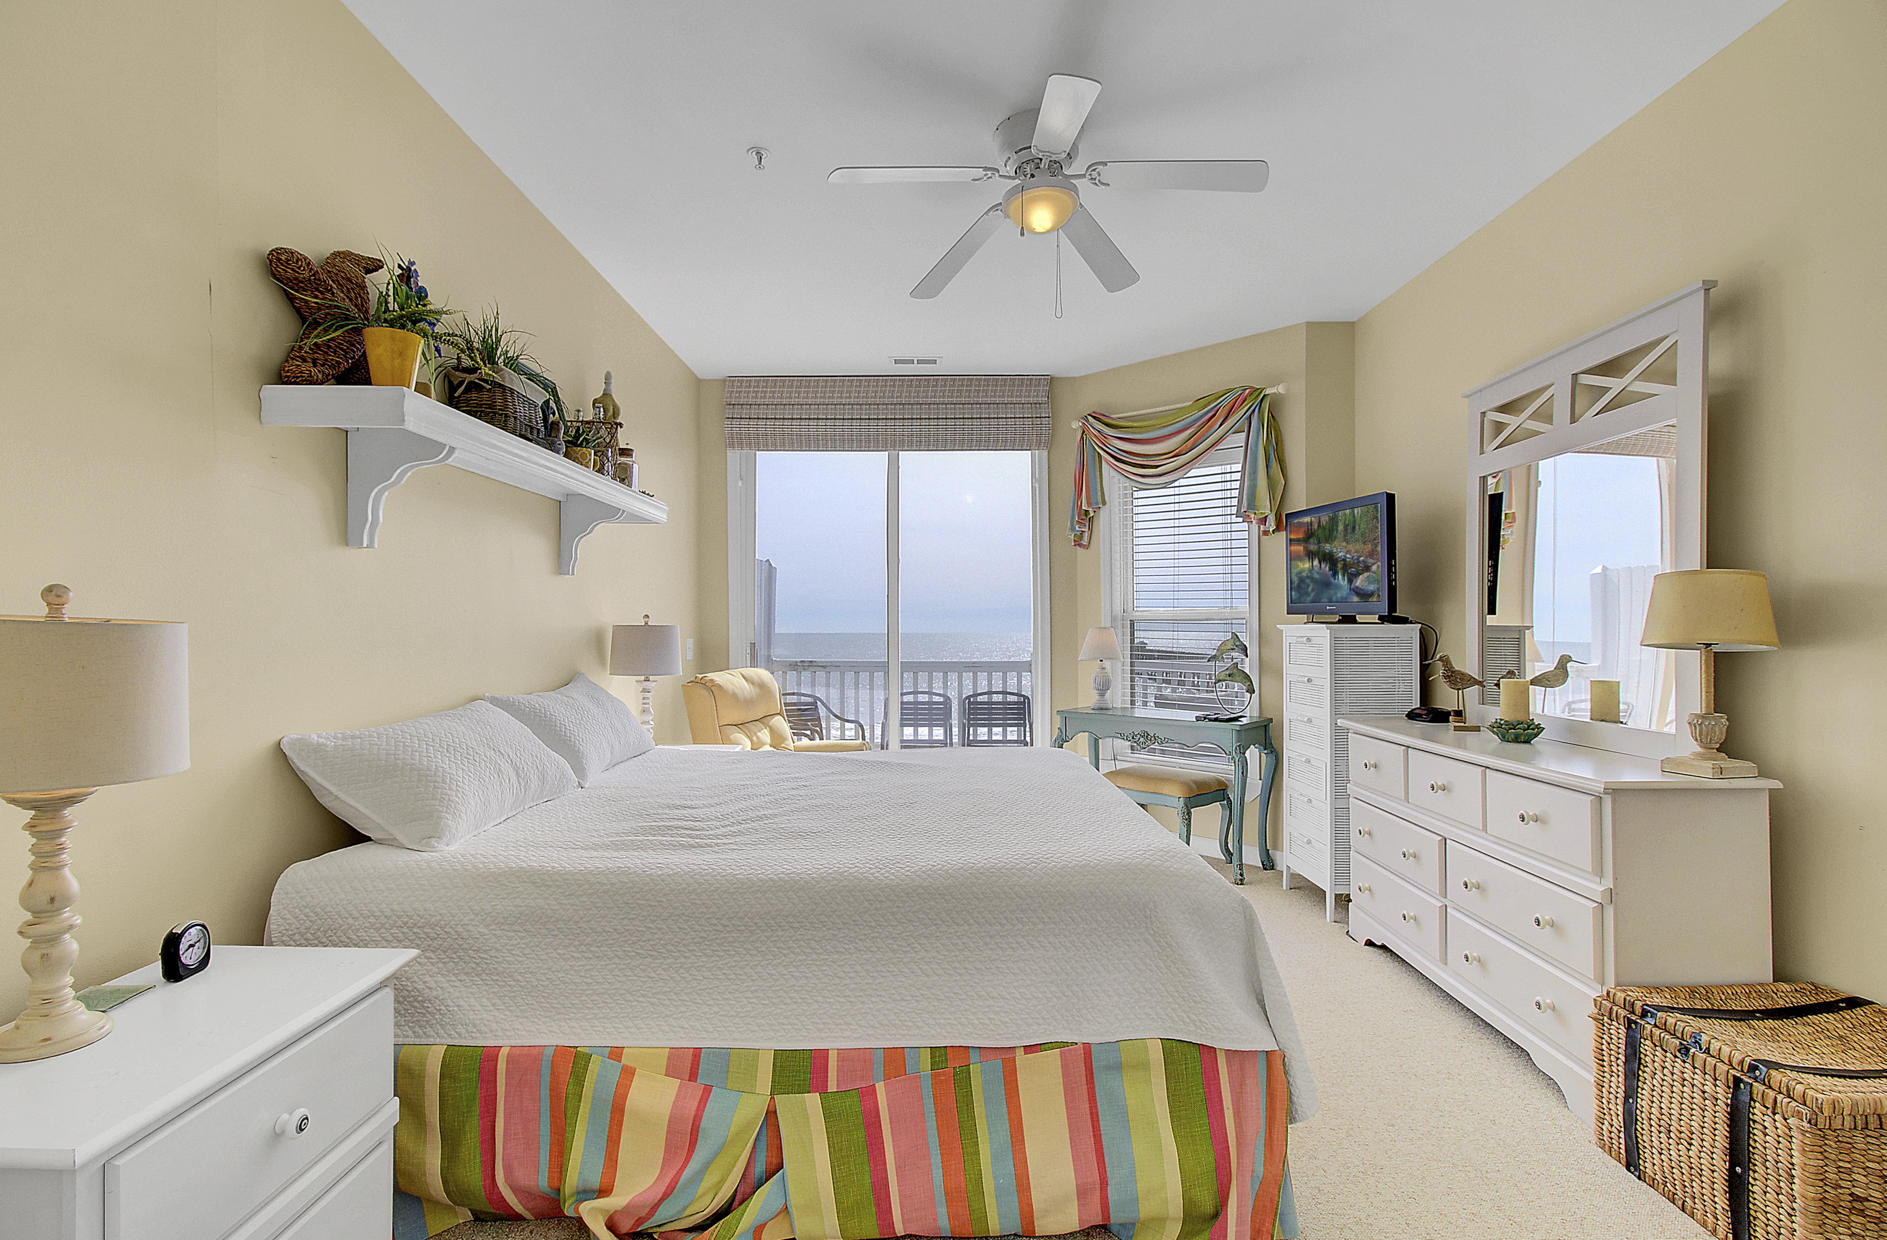 Seaside Villas I Homes For Sale - 111 Arctic, Folly Beach, SC - 28